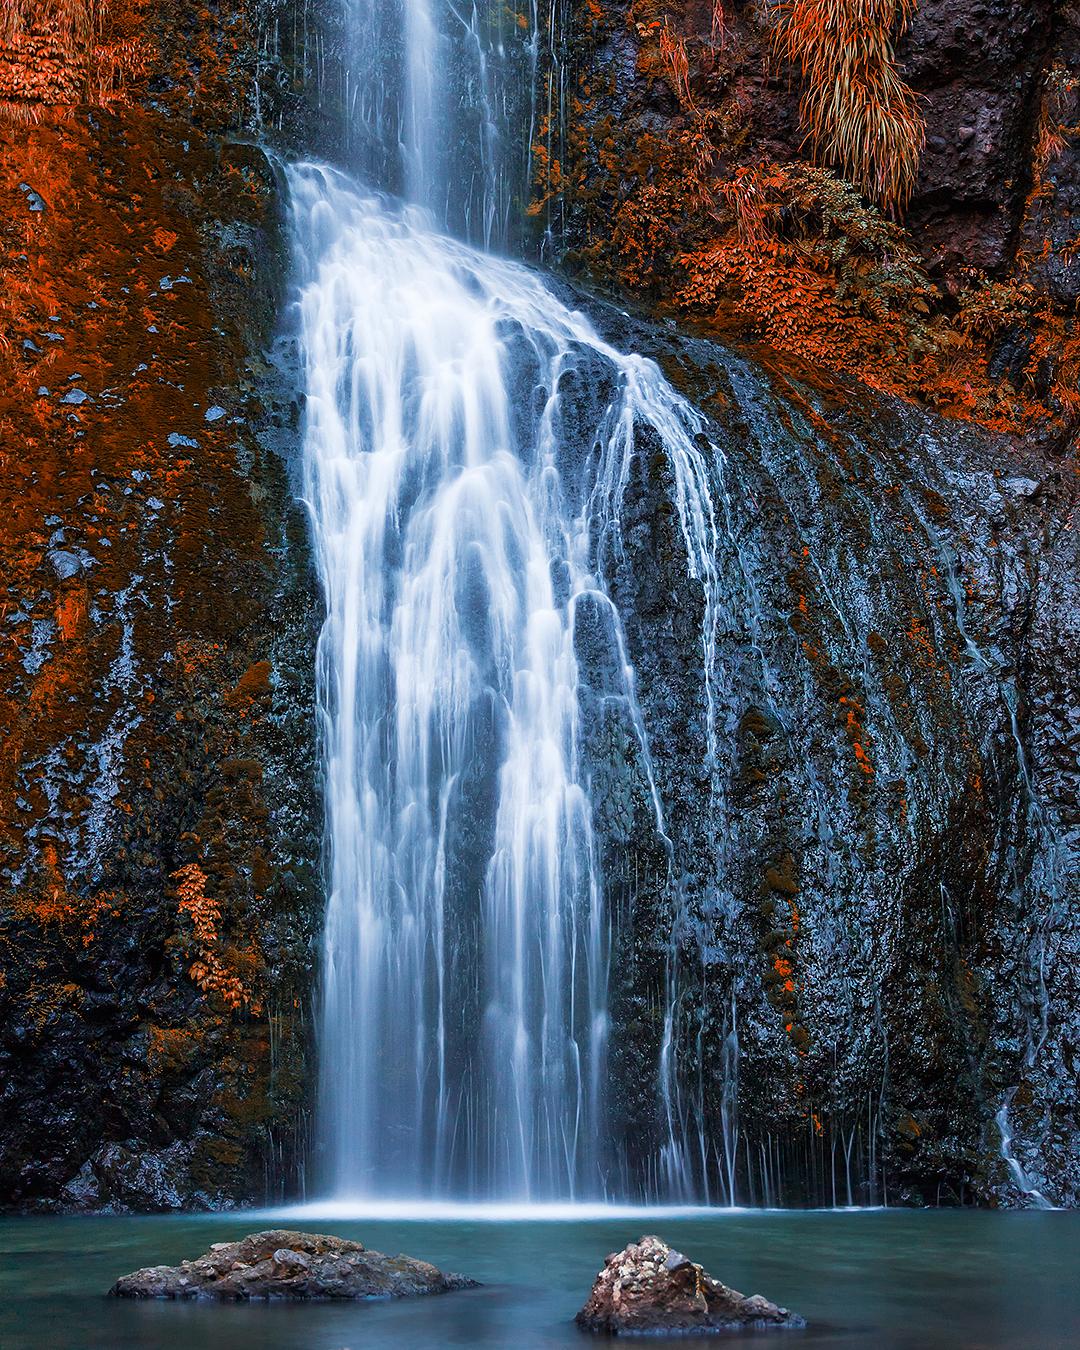 Kitekite falls in the autumn.